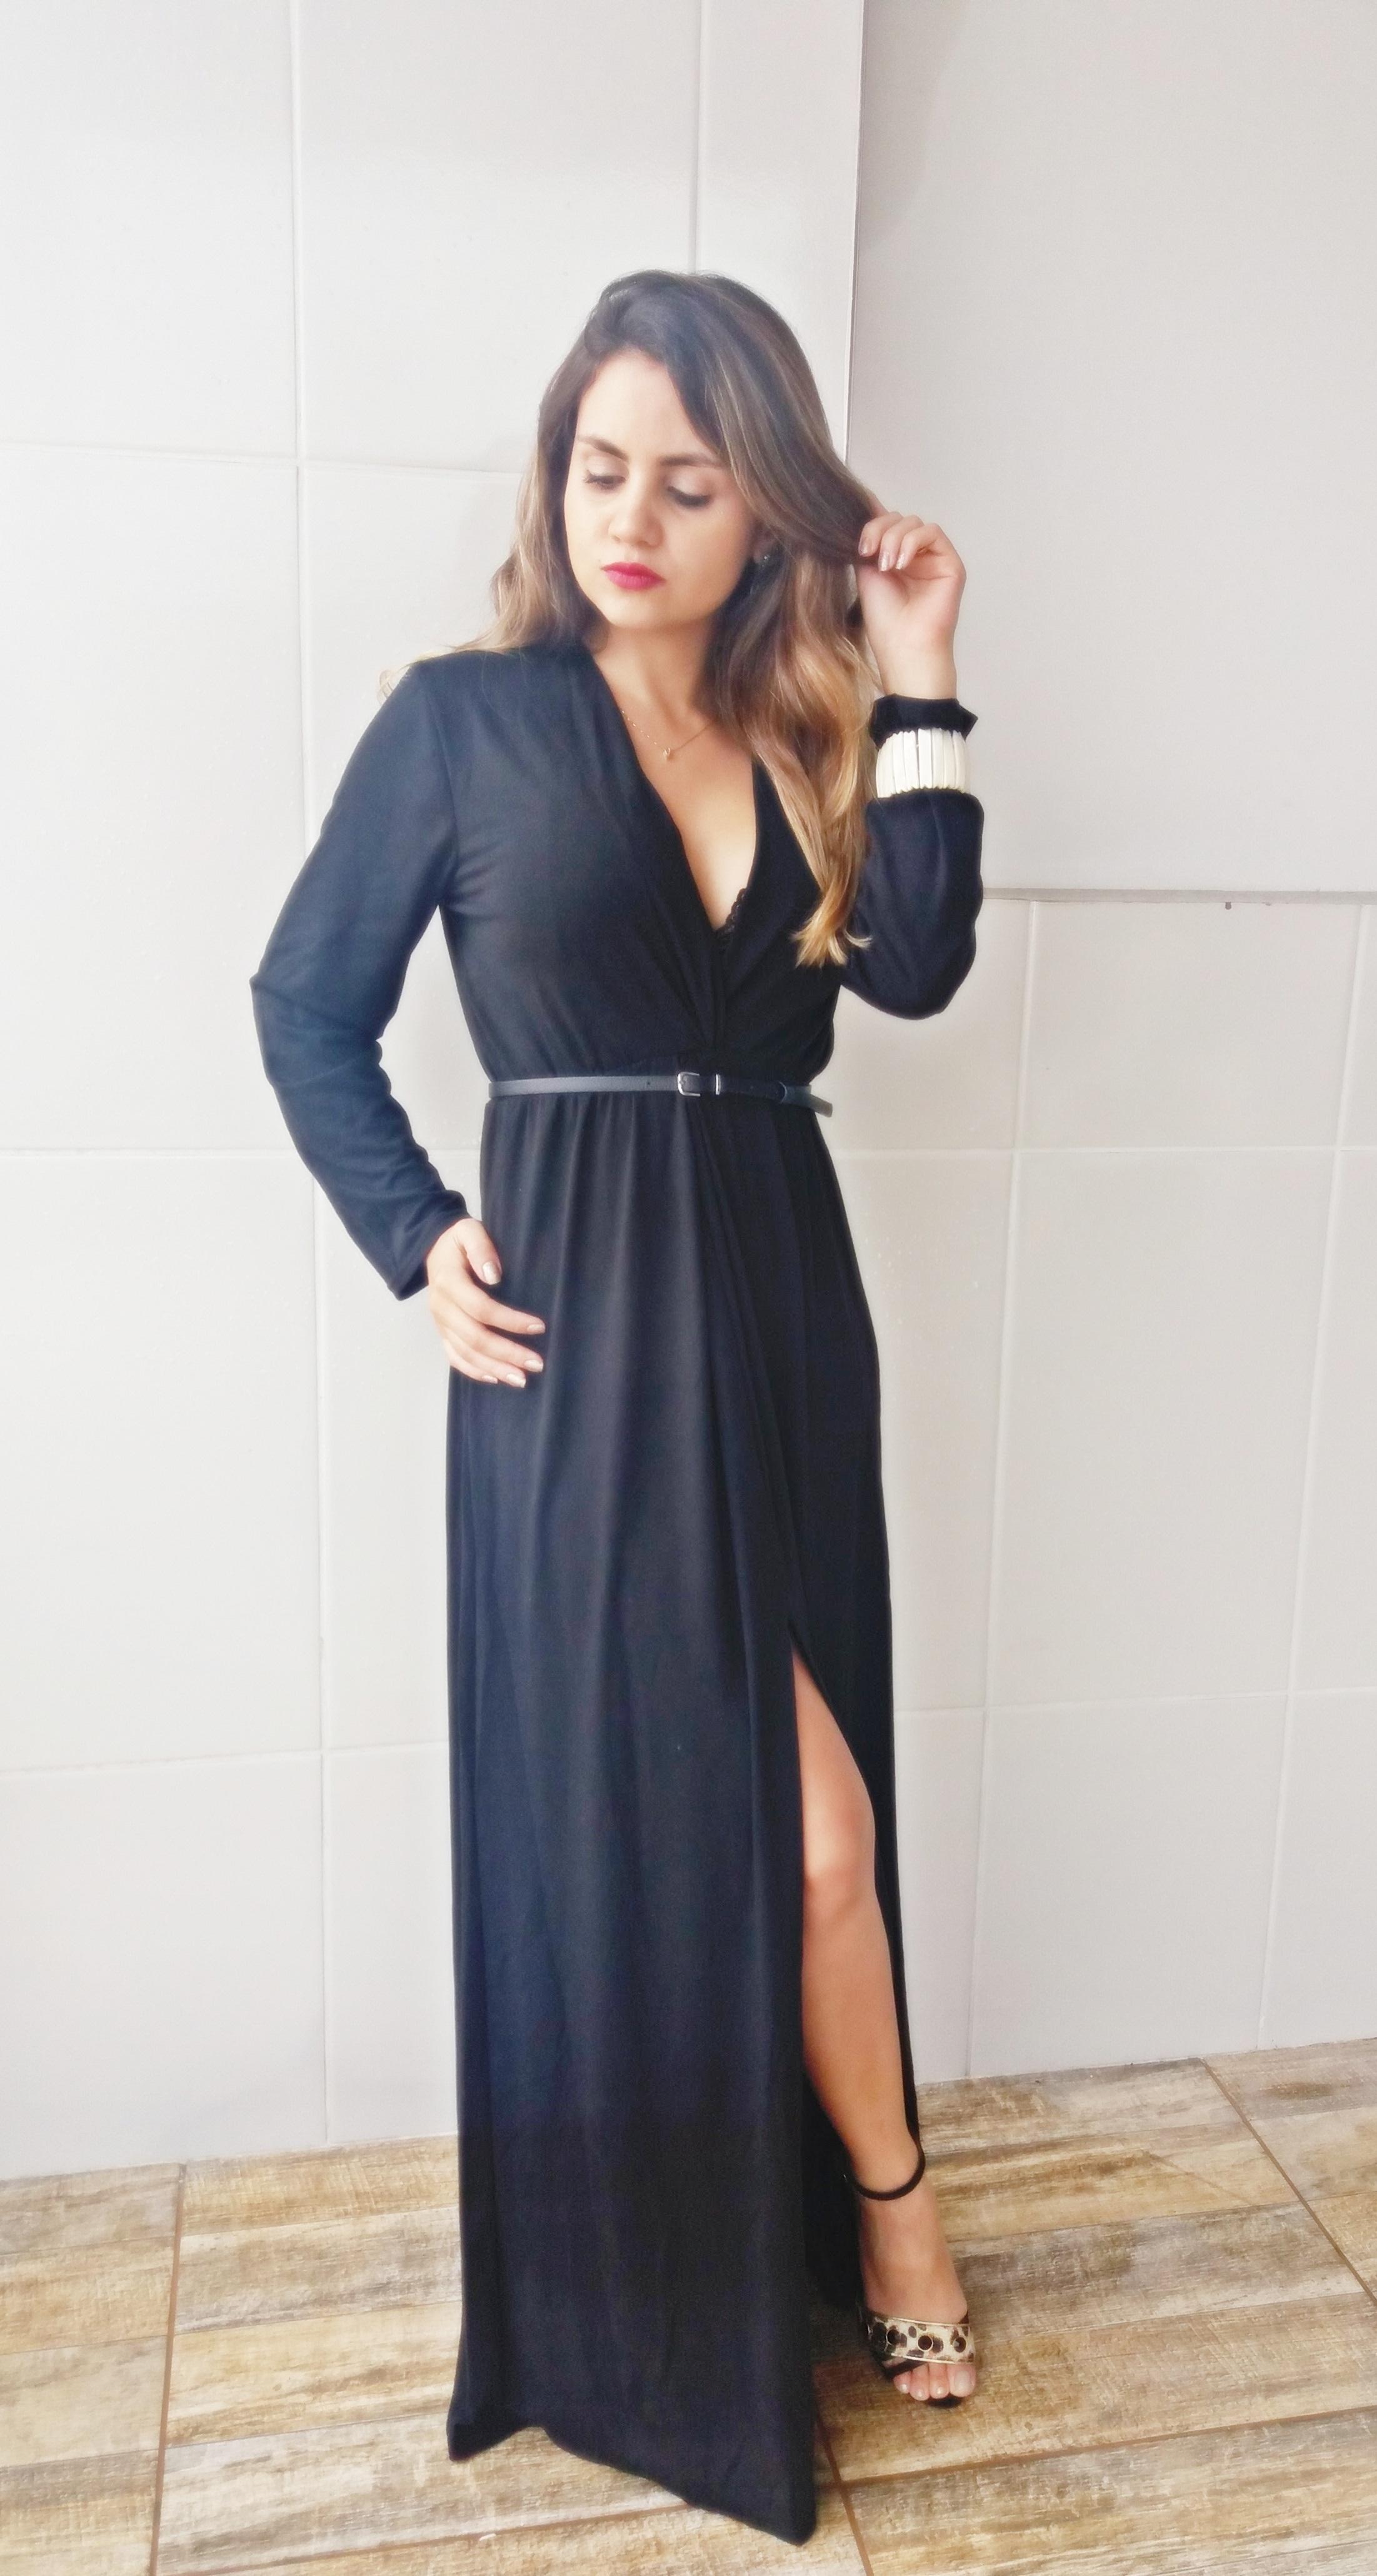 20170118_160403 Look da ka: Fatal Longo Black Dress